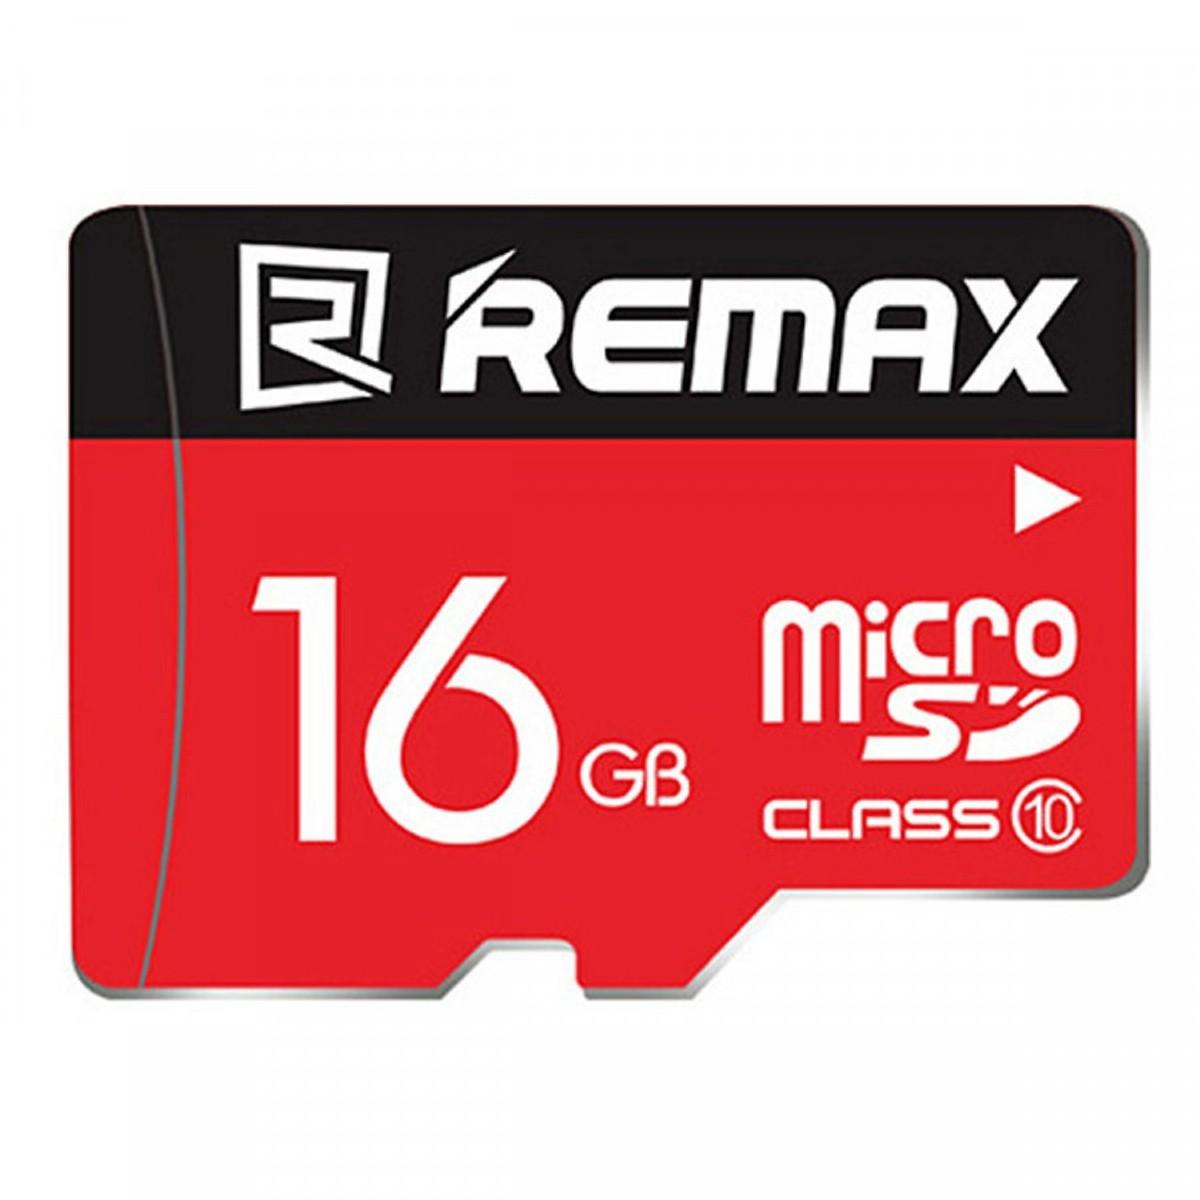 Hoco - Thẻ Nhớ Remax 16GB